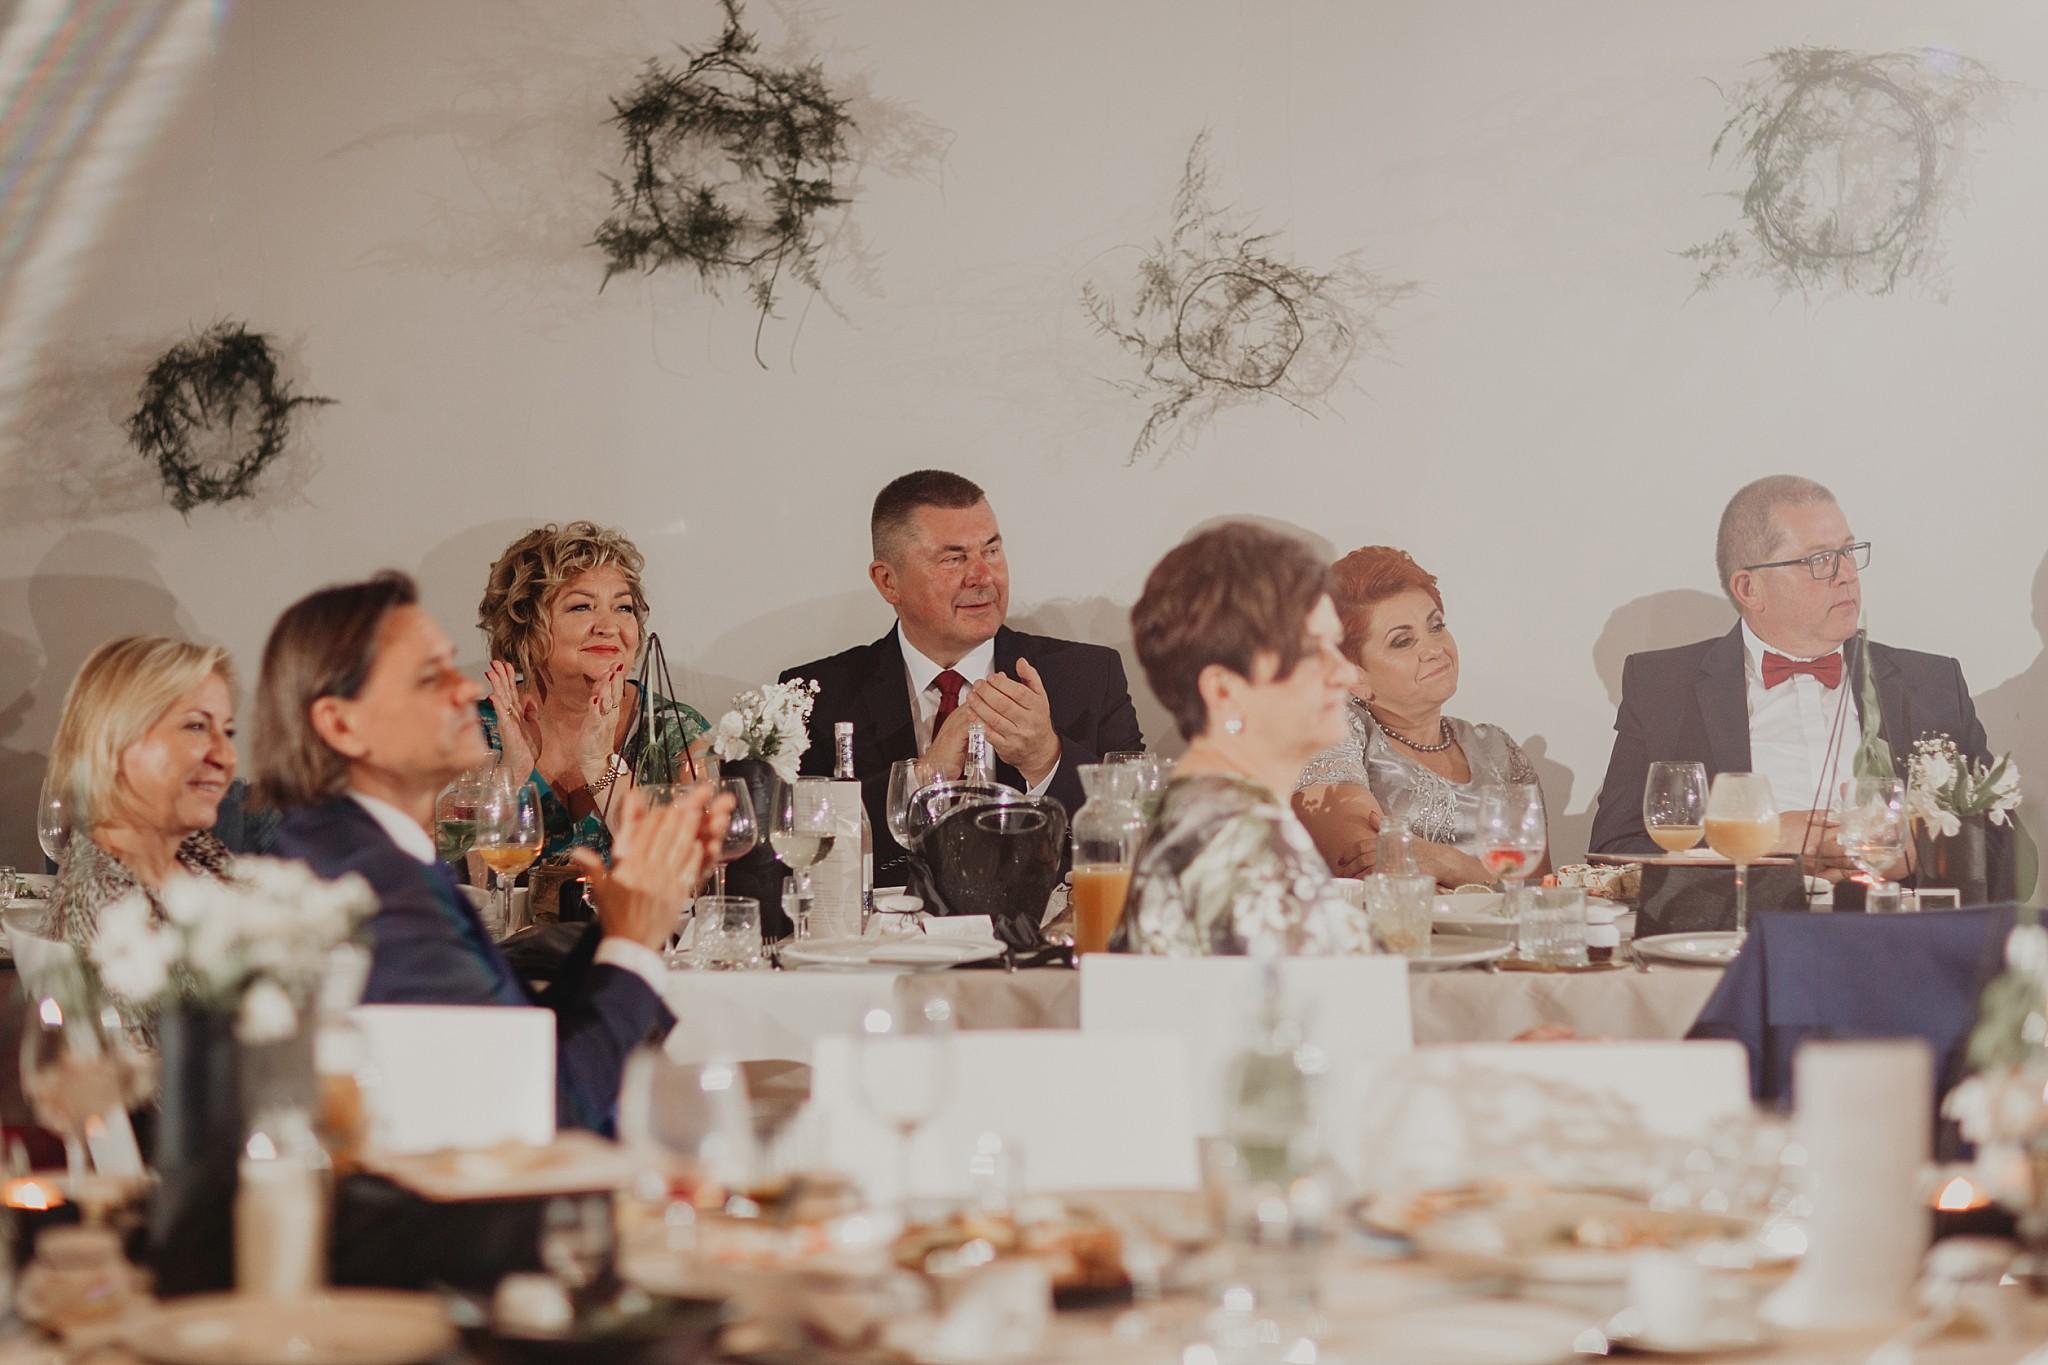 fotograf poznan wesele dobra truskawka piekne wesele pod poznaniem wesele w dobrej truskawce piekna para mloda slub marzen slub koronawirus slub listopad wesele koronawirus 494